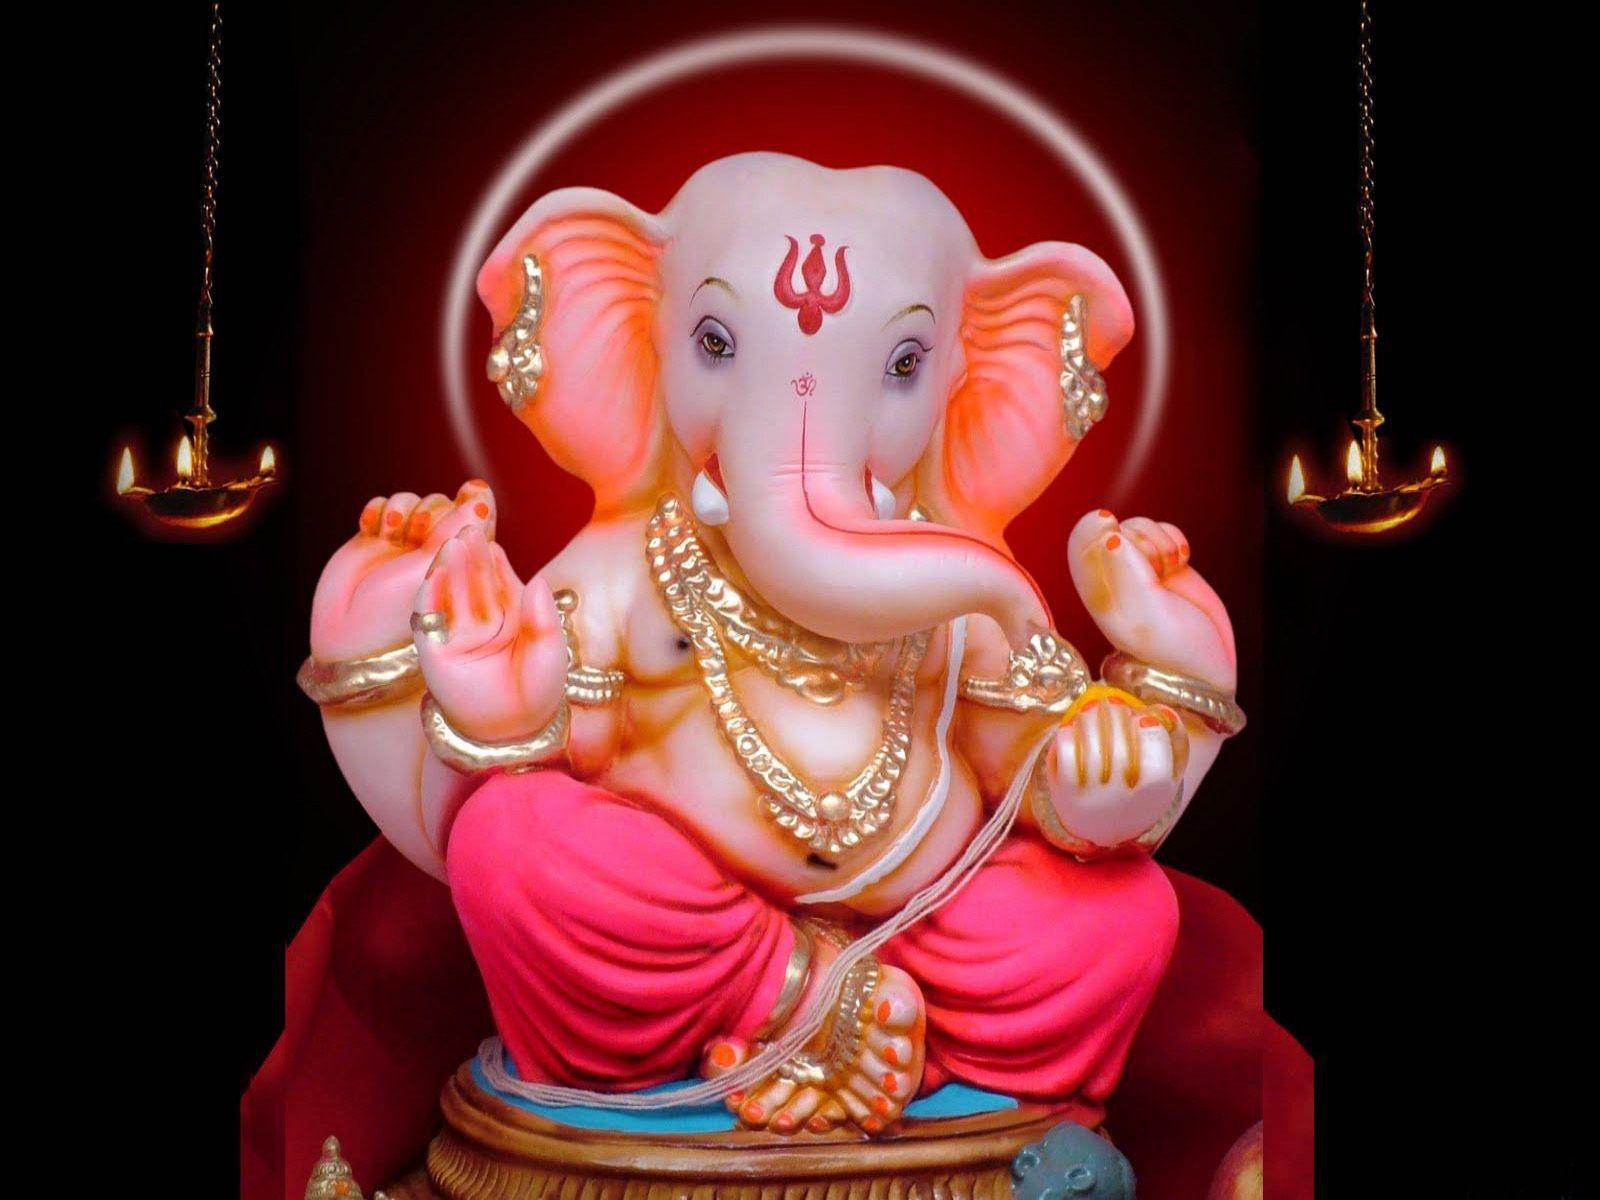 Hd wallpaper ganesh ji - Get Ncdex Sure Shot Tips From Mrisecurities Happy Ganesh Chaturthi Ganesh Wallpaperhd